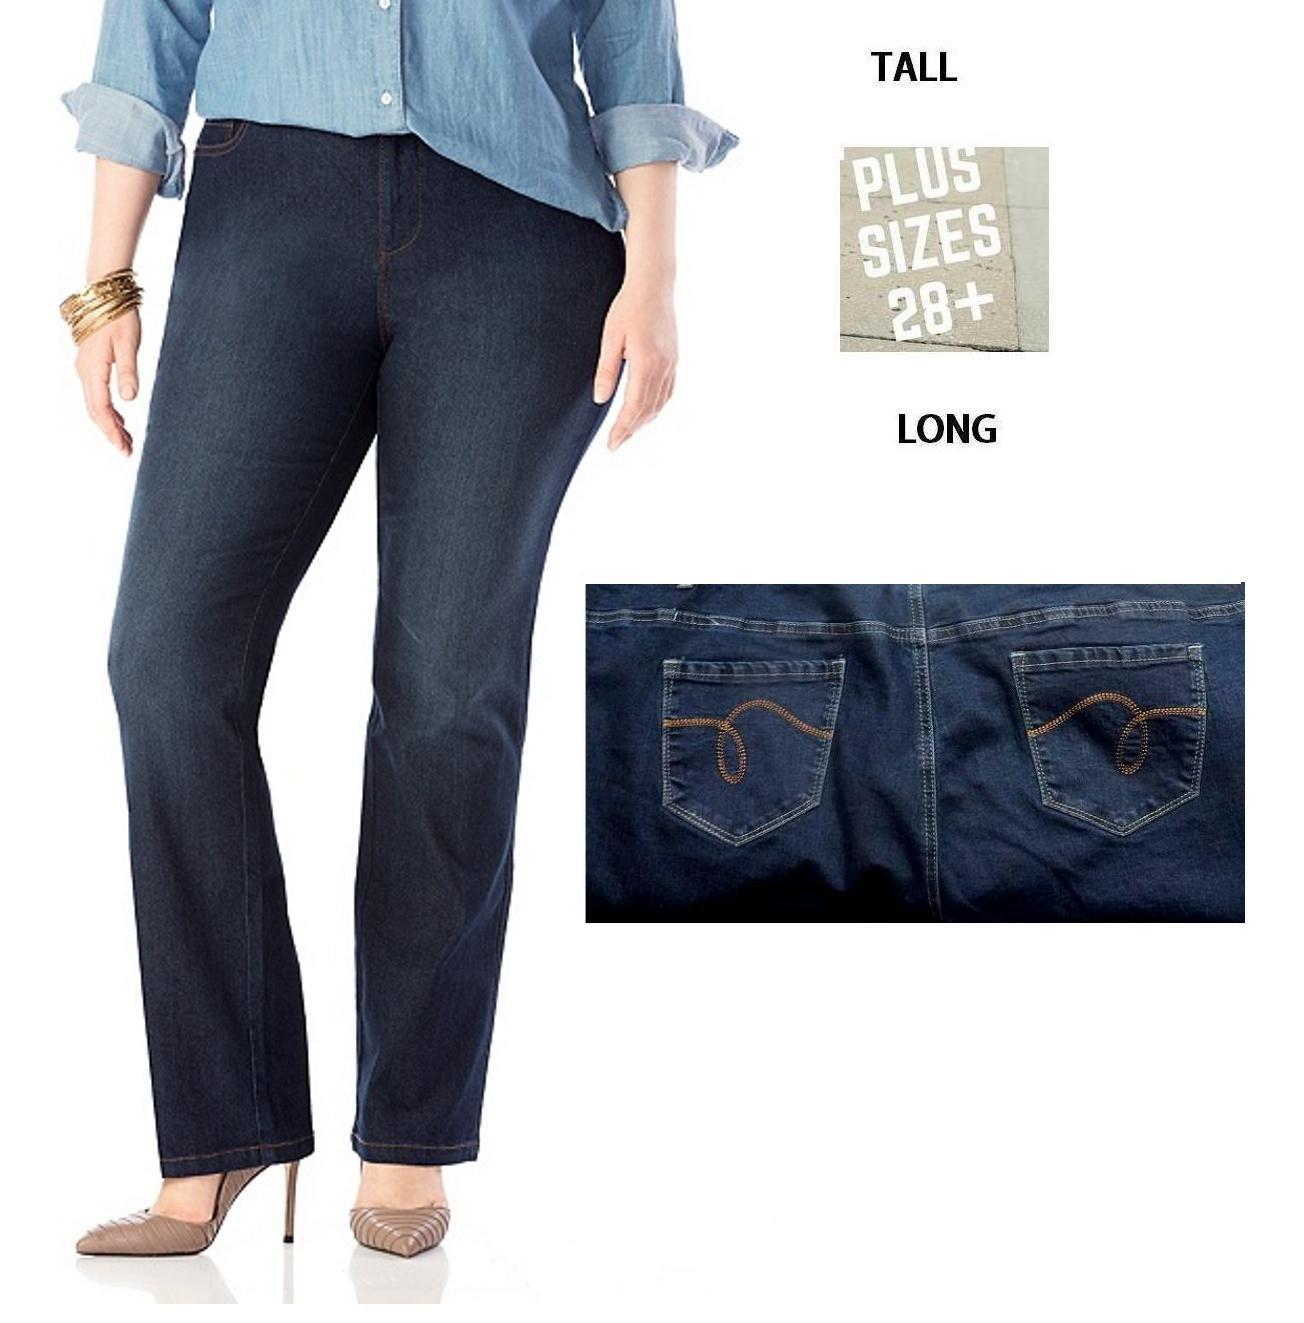 TL18 Womens Plus Size Tall Tummy Control Bootcut Delux Stretch Denim JEANS Pants (24-PLUS TALL)